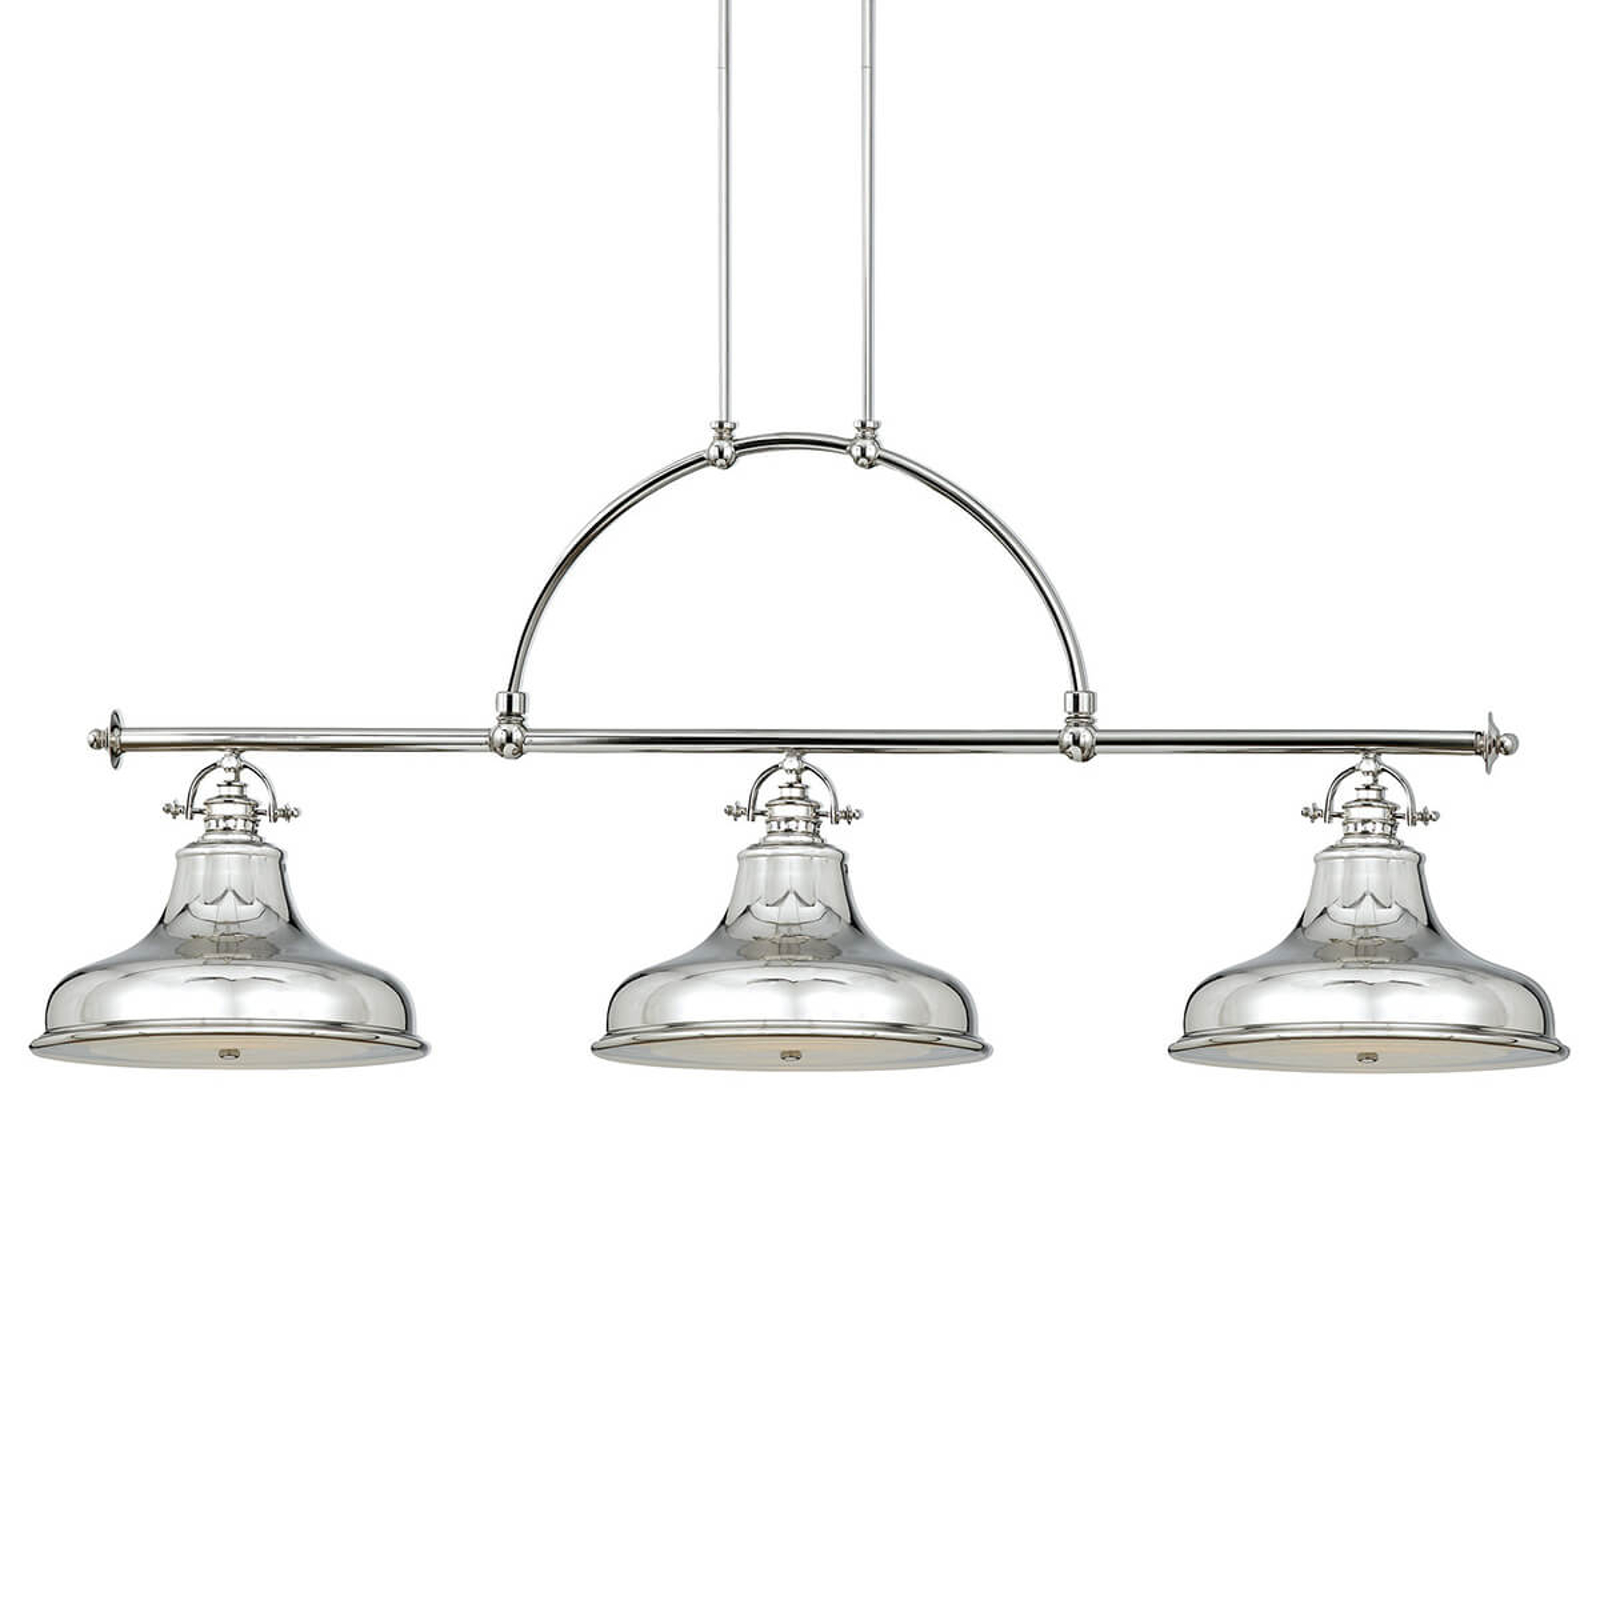 Lampada sospensione Emery 3 luci argento